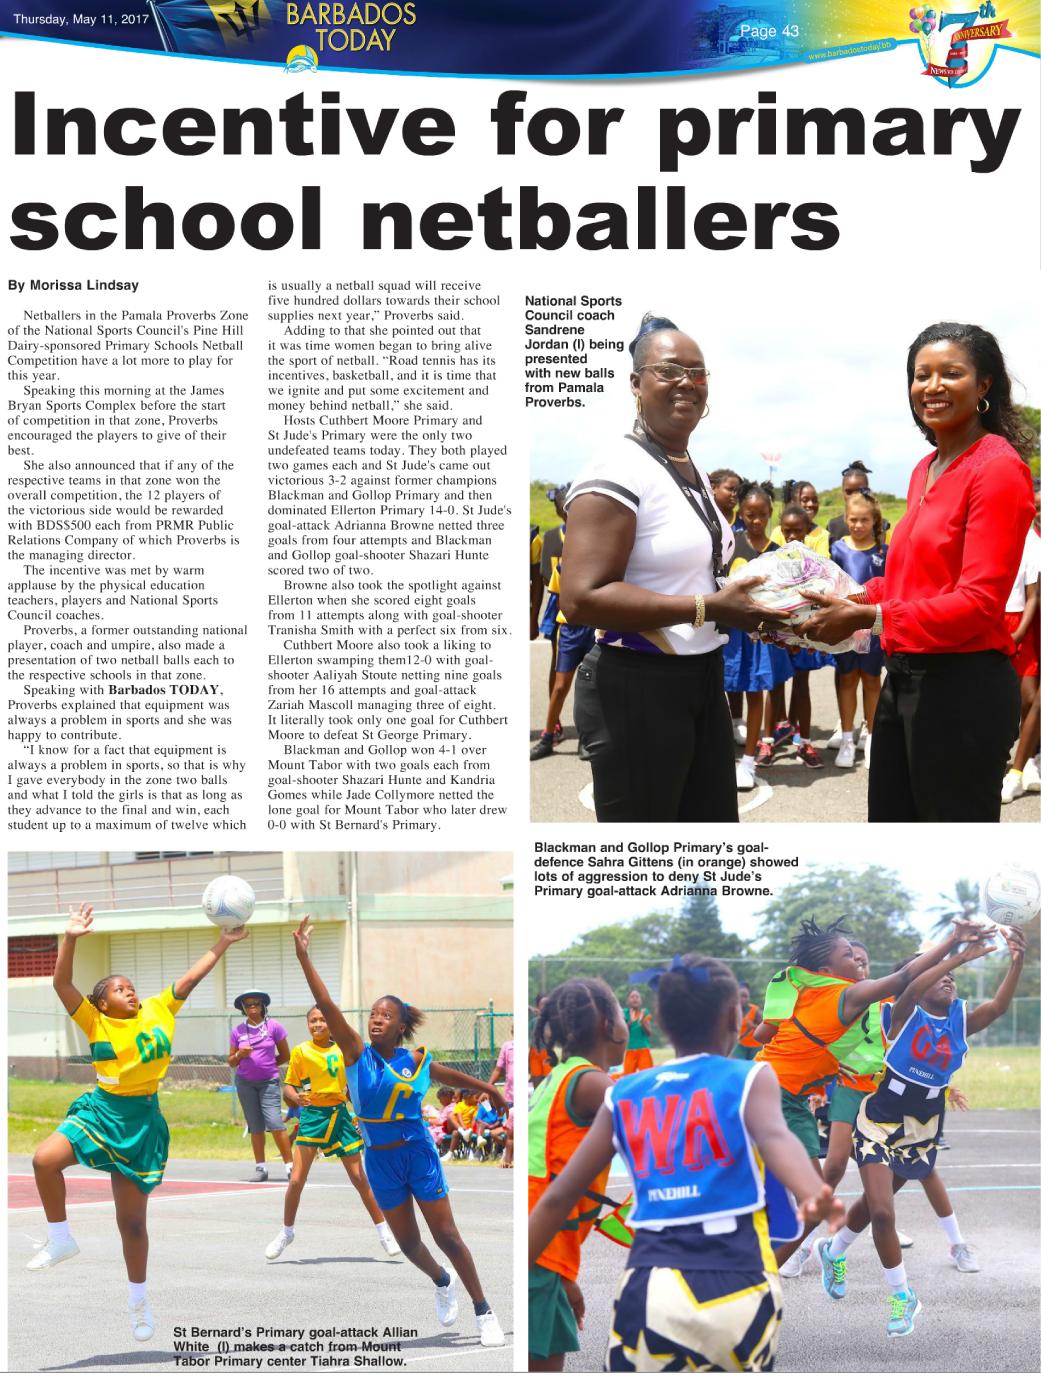 Pamala Proverbs of PRMR Inc. donates netballs to Barbadian athletes